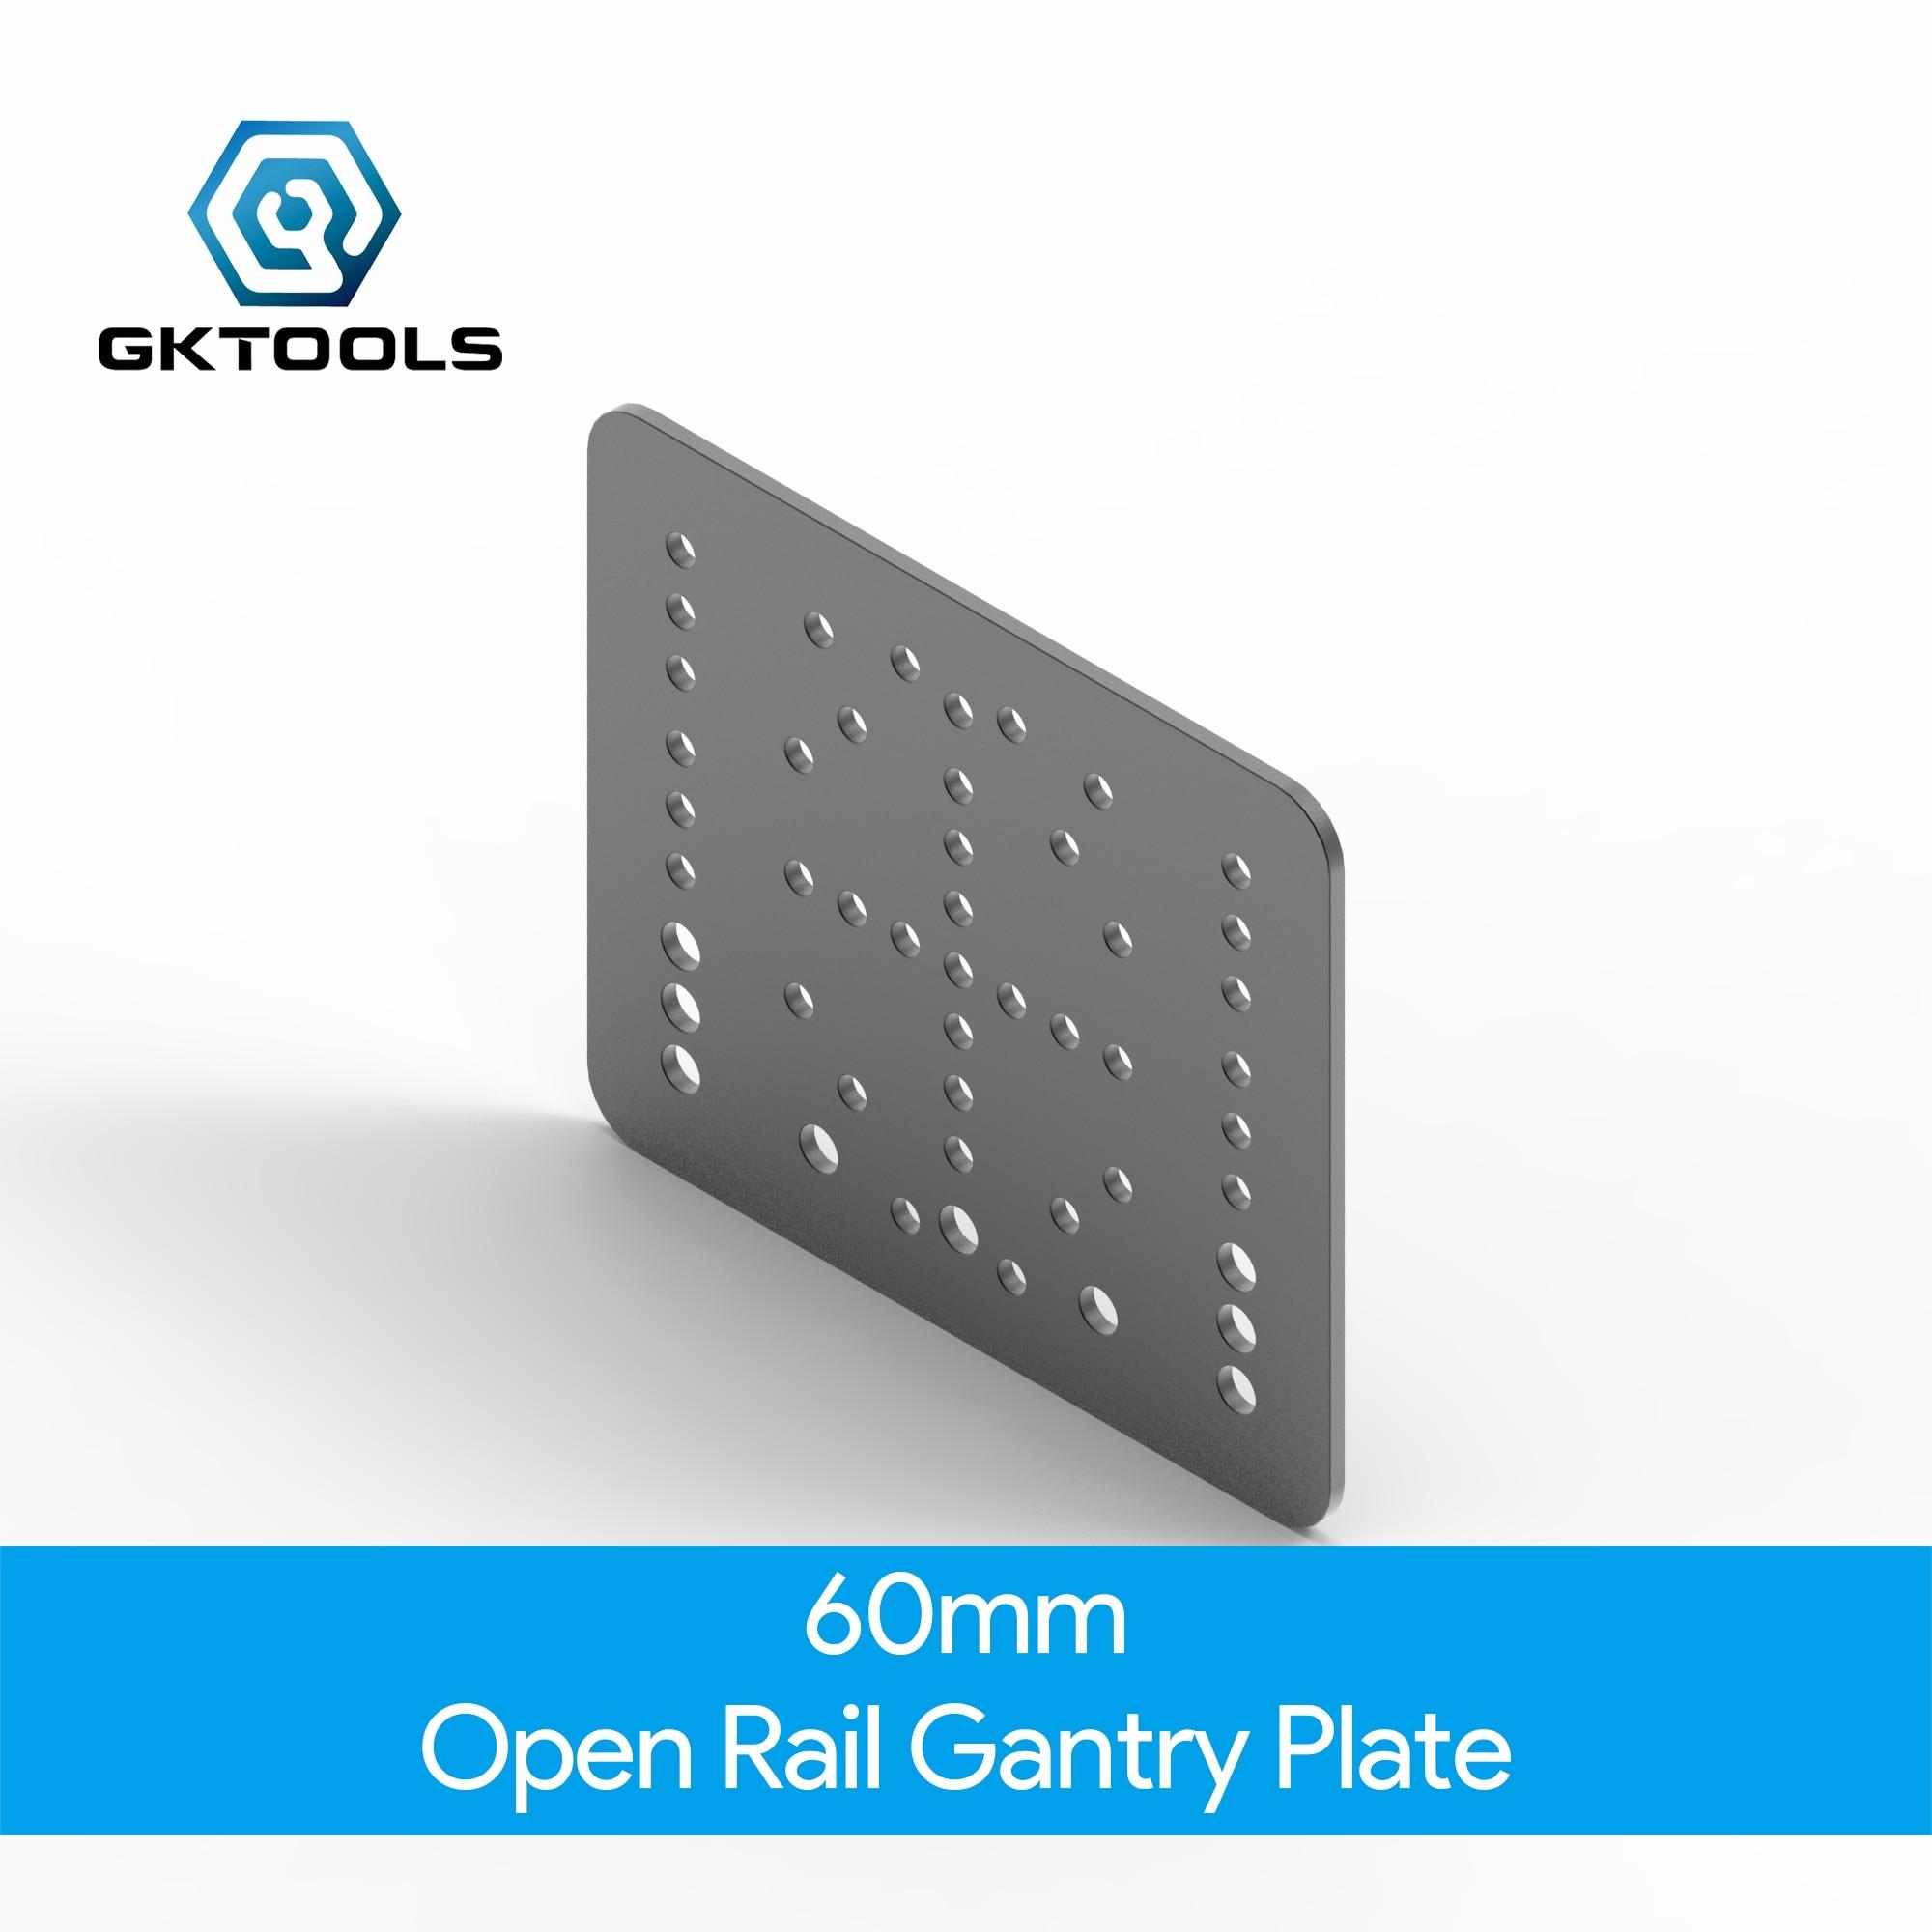 OpenBuilds OpenRail Gantry Plate 60mm